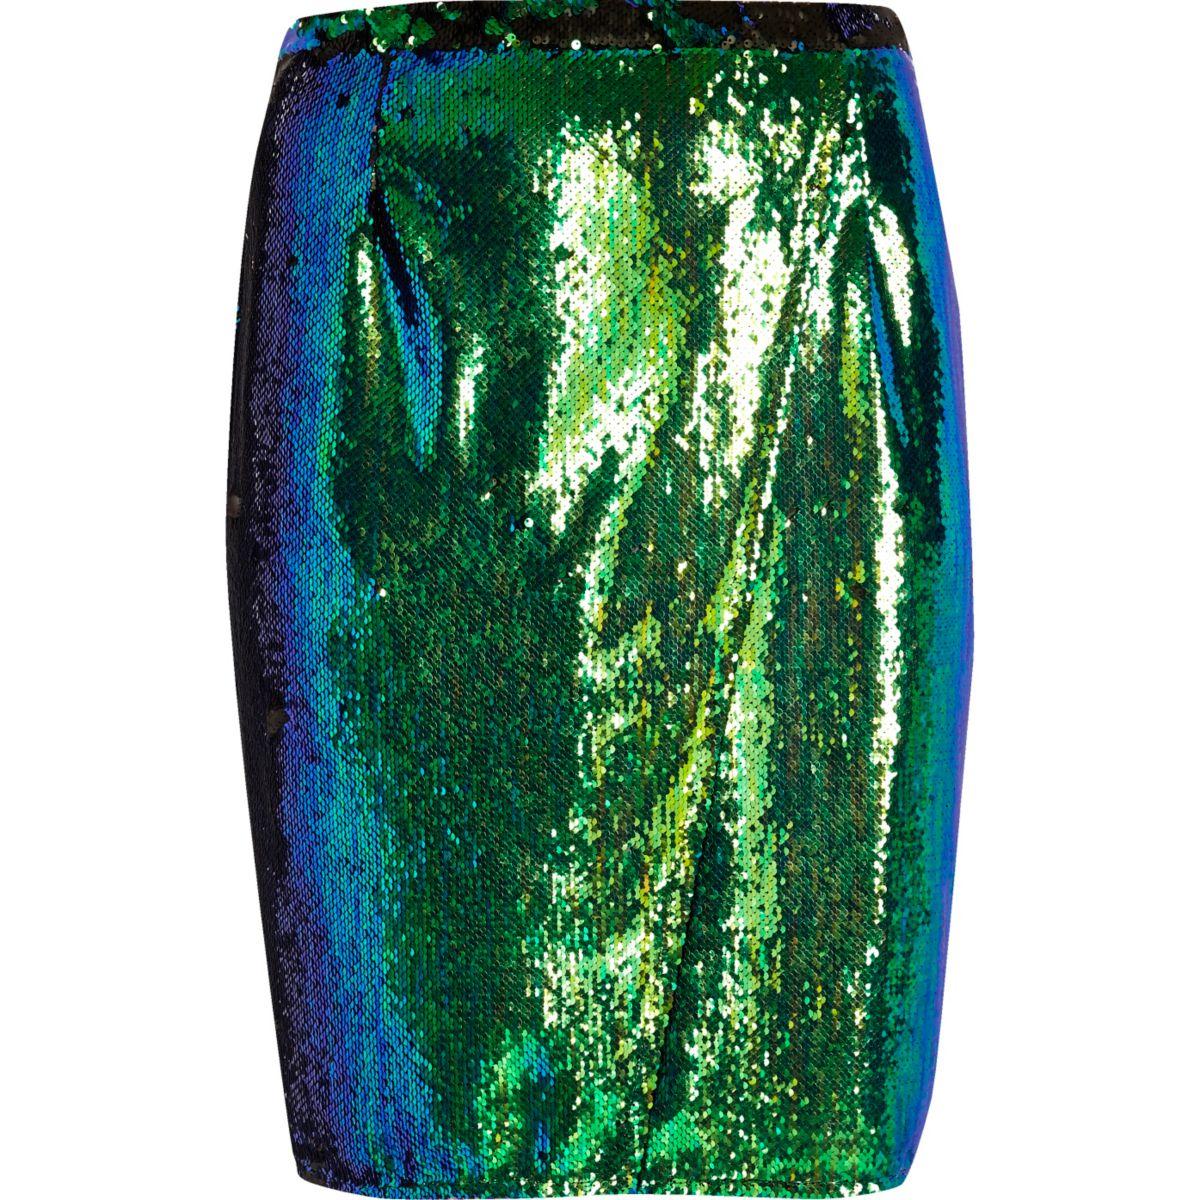 Plus – Jadegrüner, paillettenverzierter Bleistiftrock